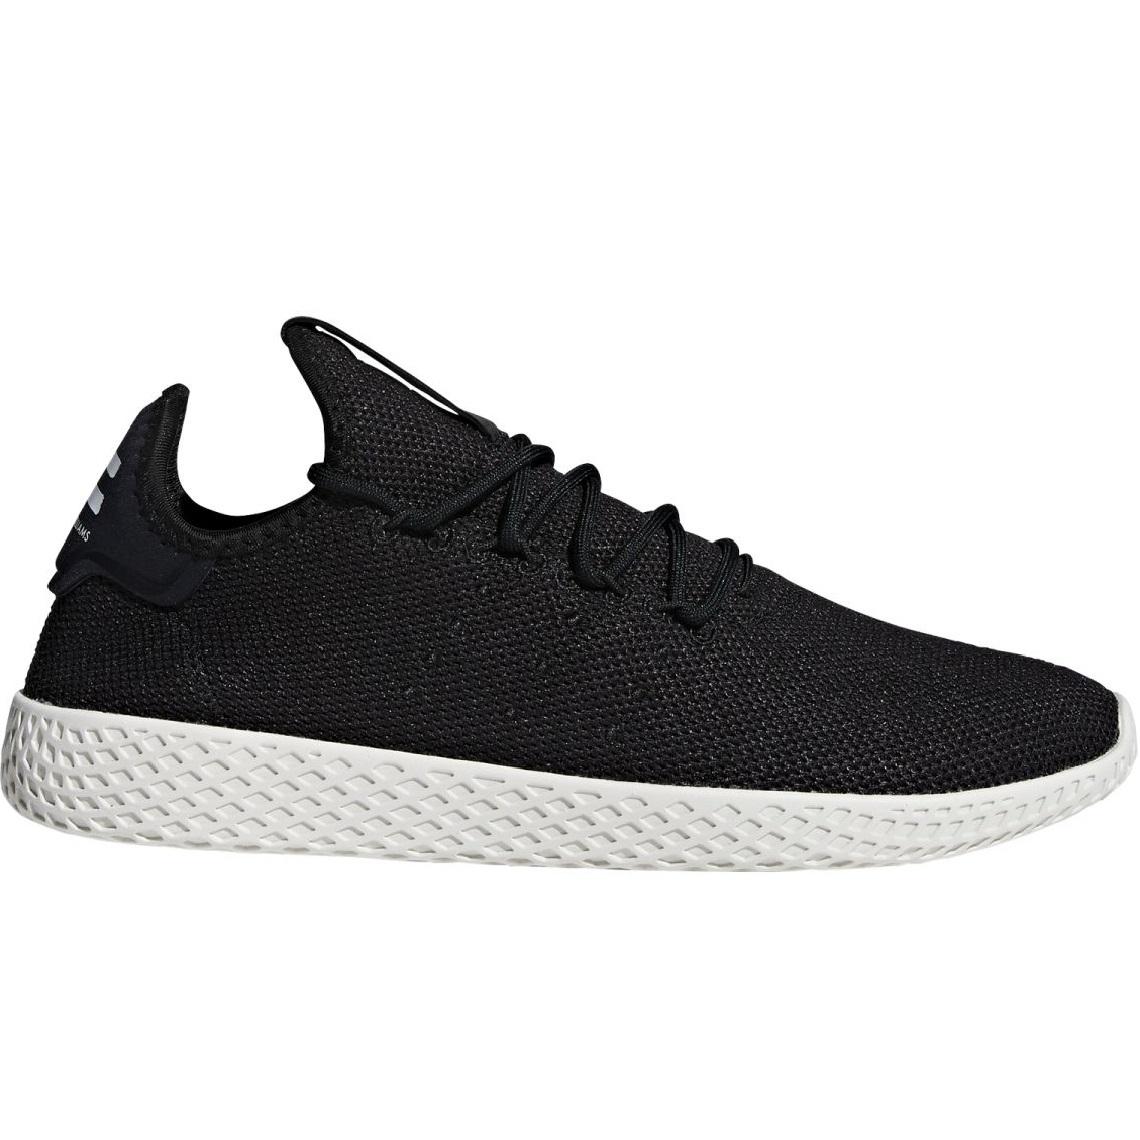 adidas Originals PW Tennis Hu Sneaker